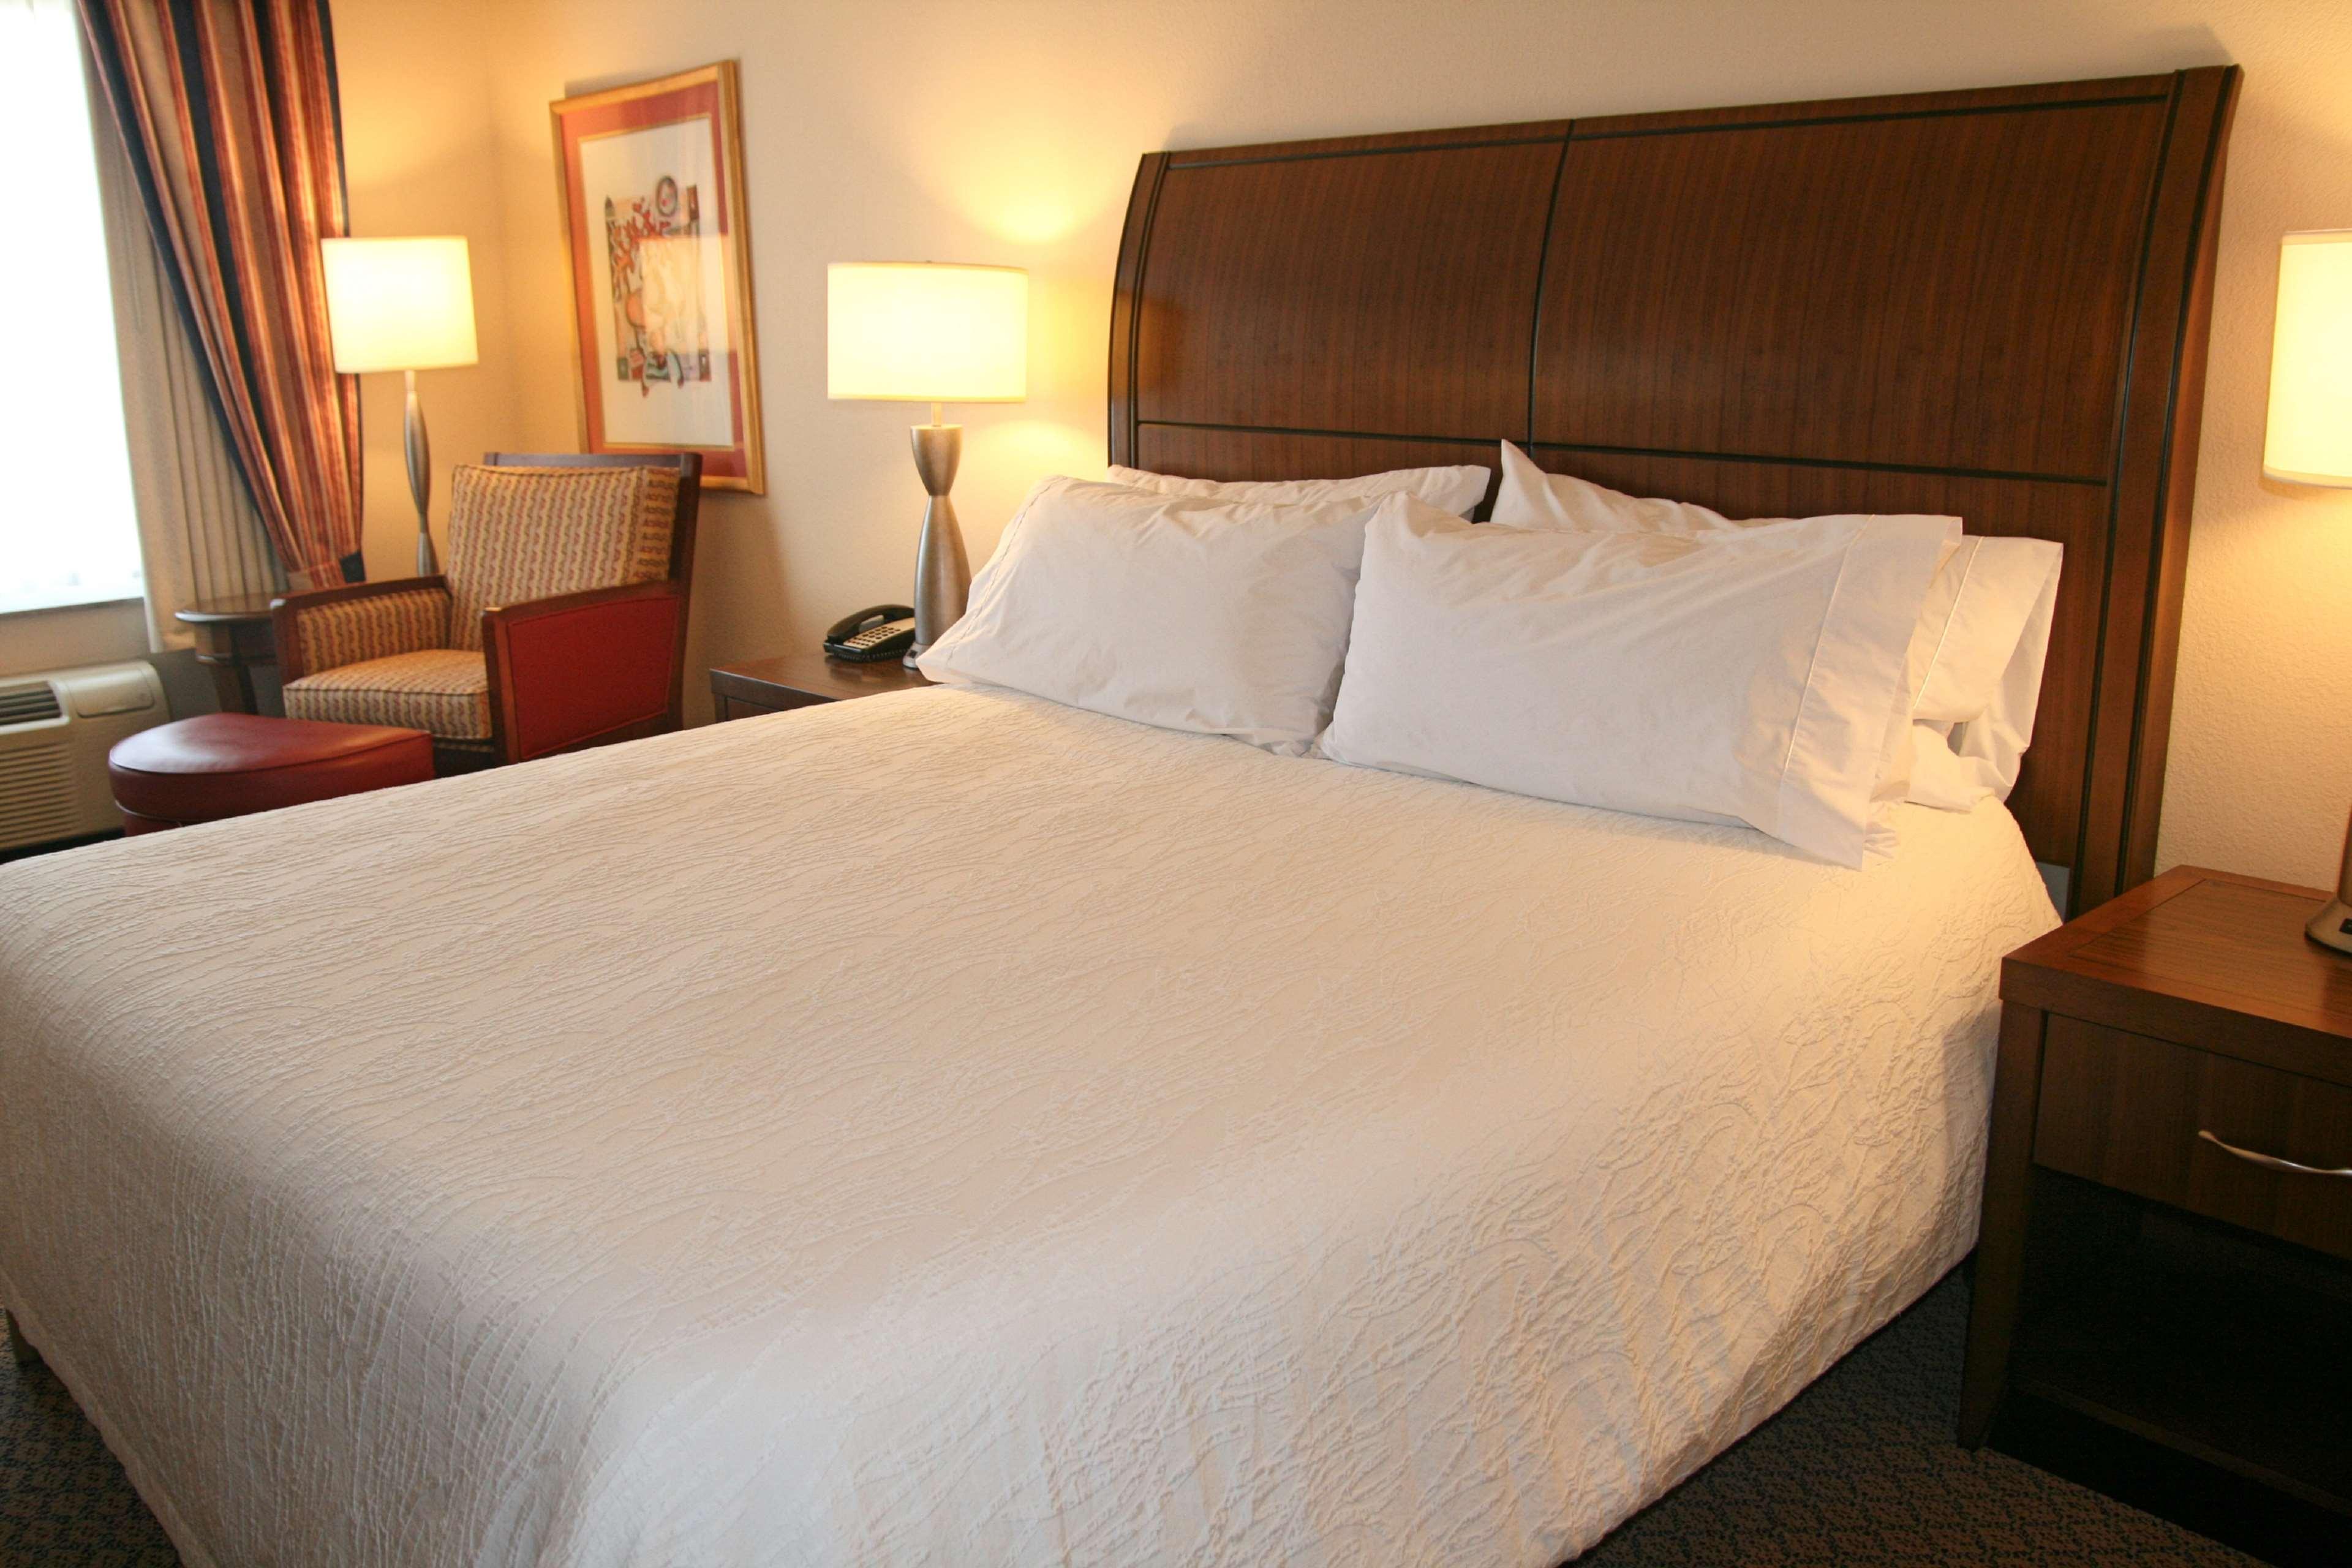 Hilton Garden Inn Elmira/Corning image 23